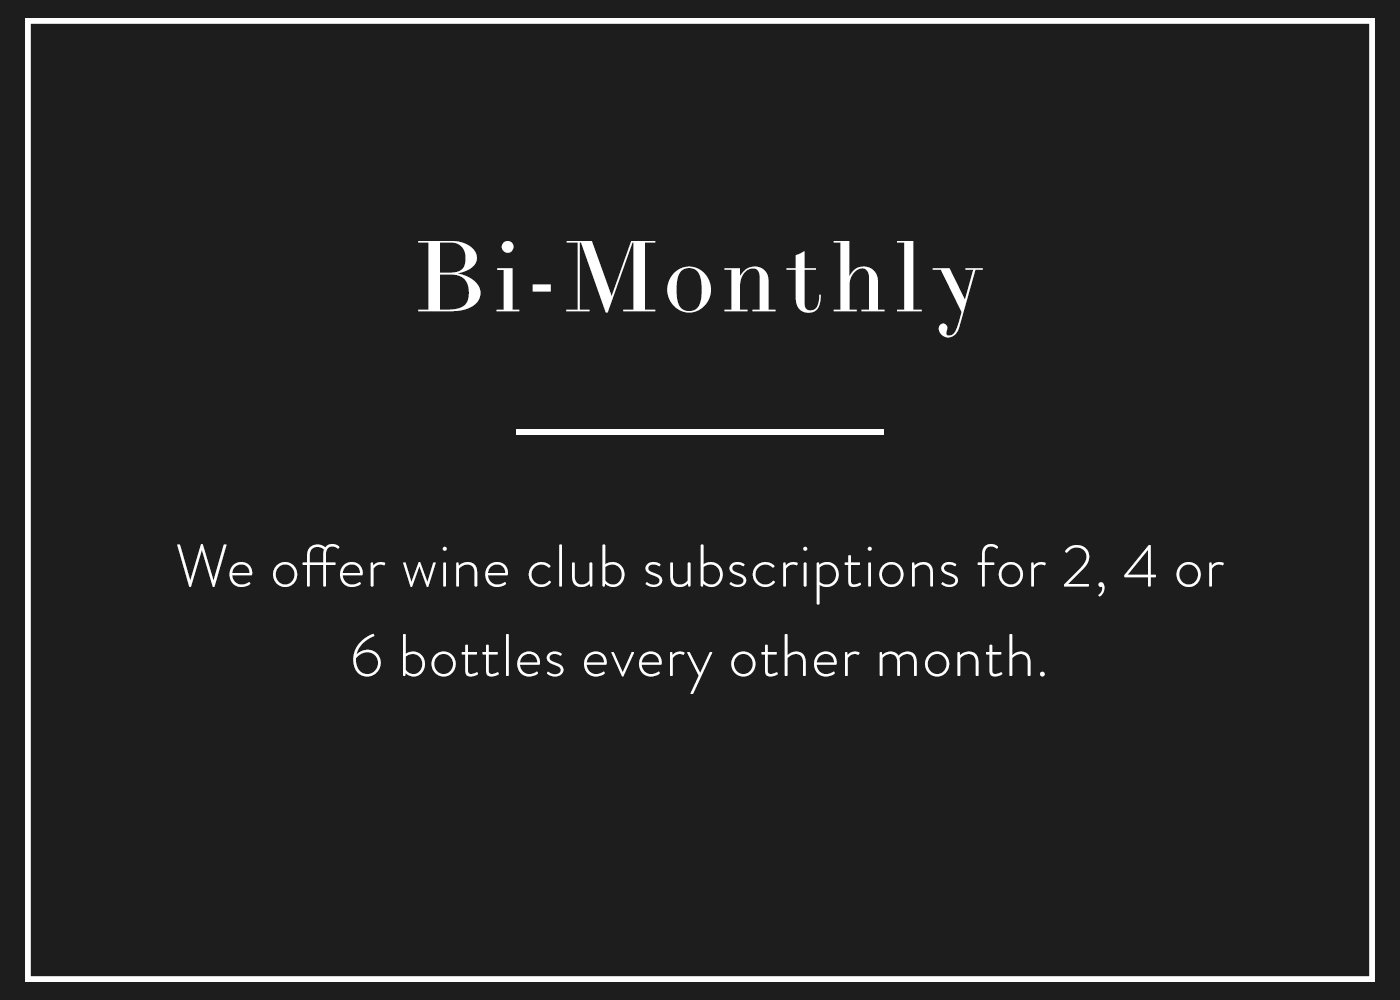 Bi-Monthly Image.jpg